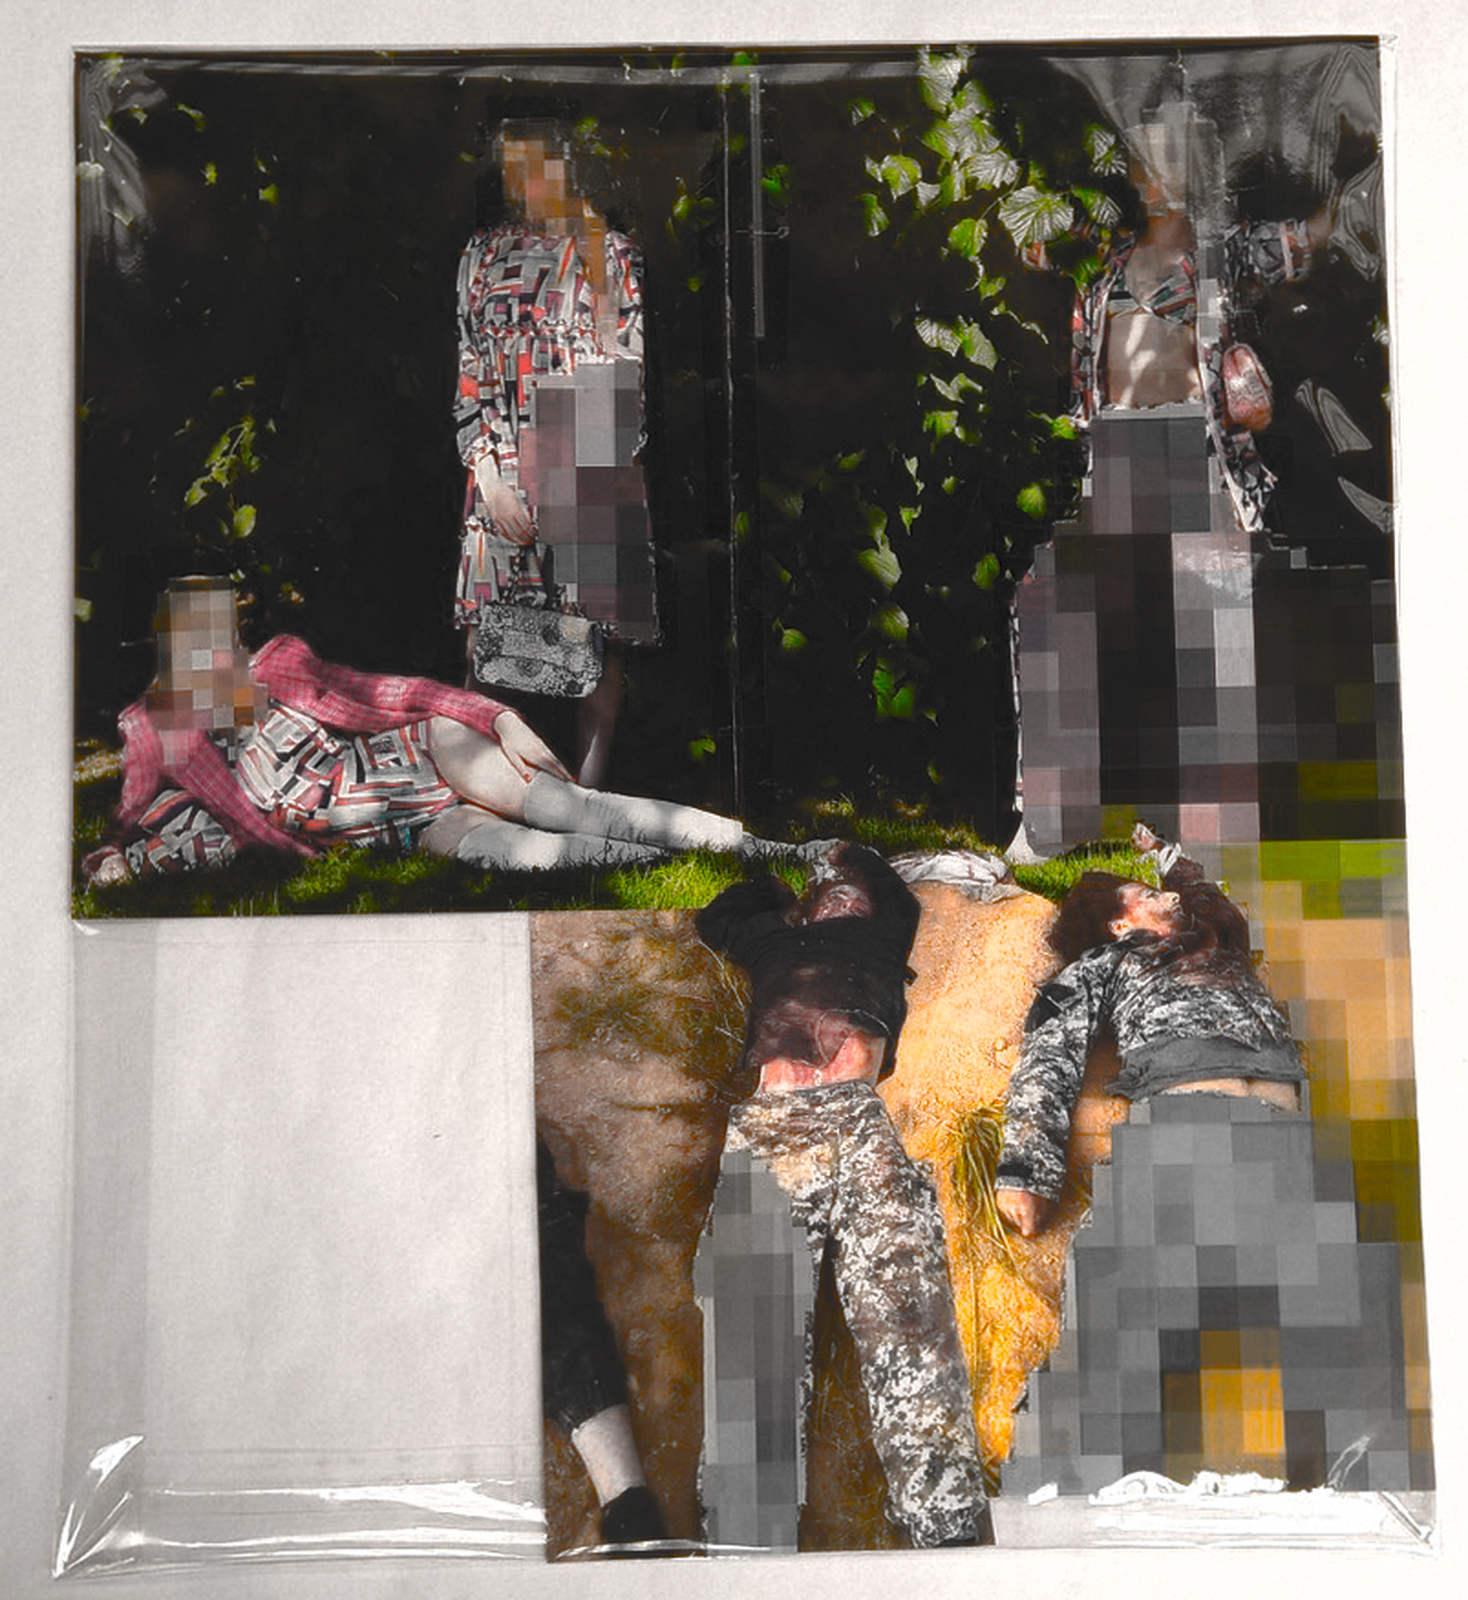 Pixel-Collage nº60, 2016, Prints, tape, transparent sheet, 52x45,5 cm